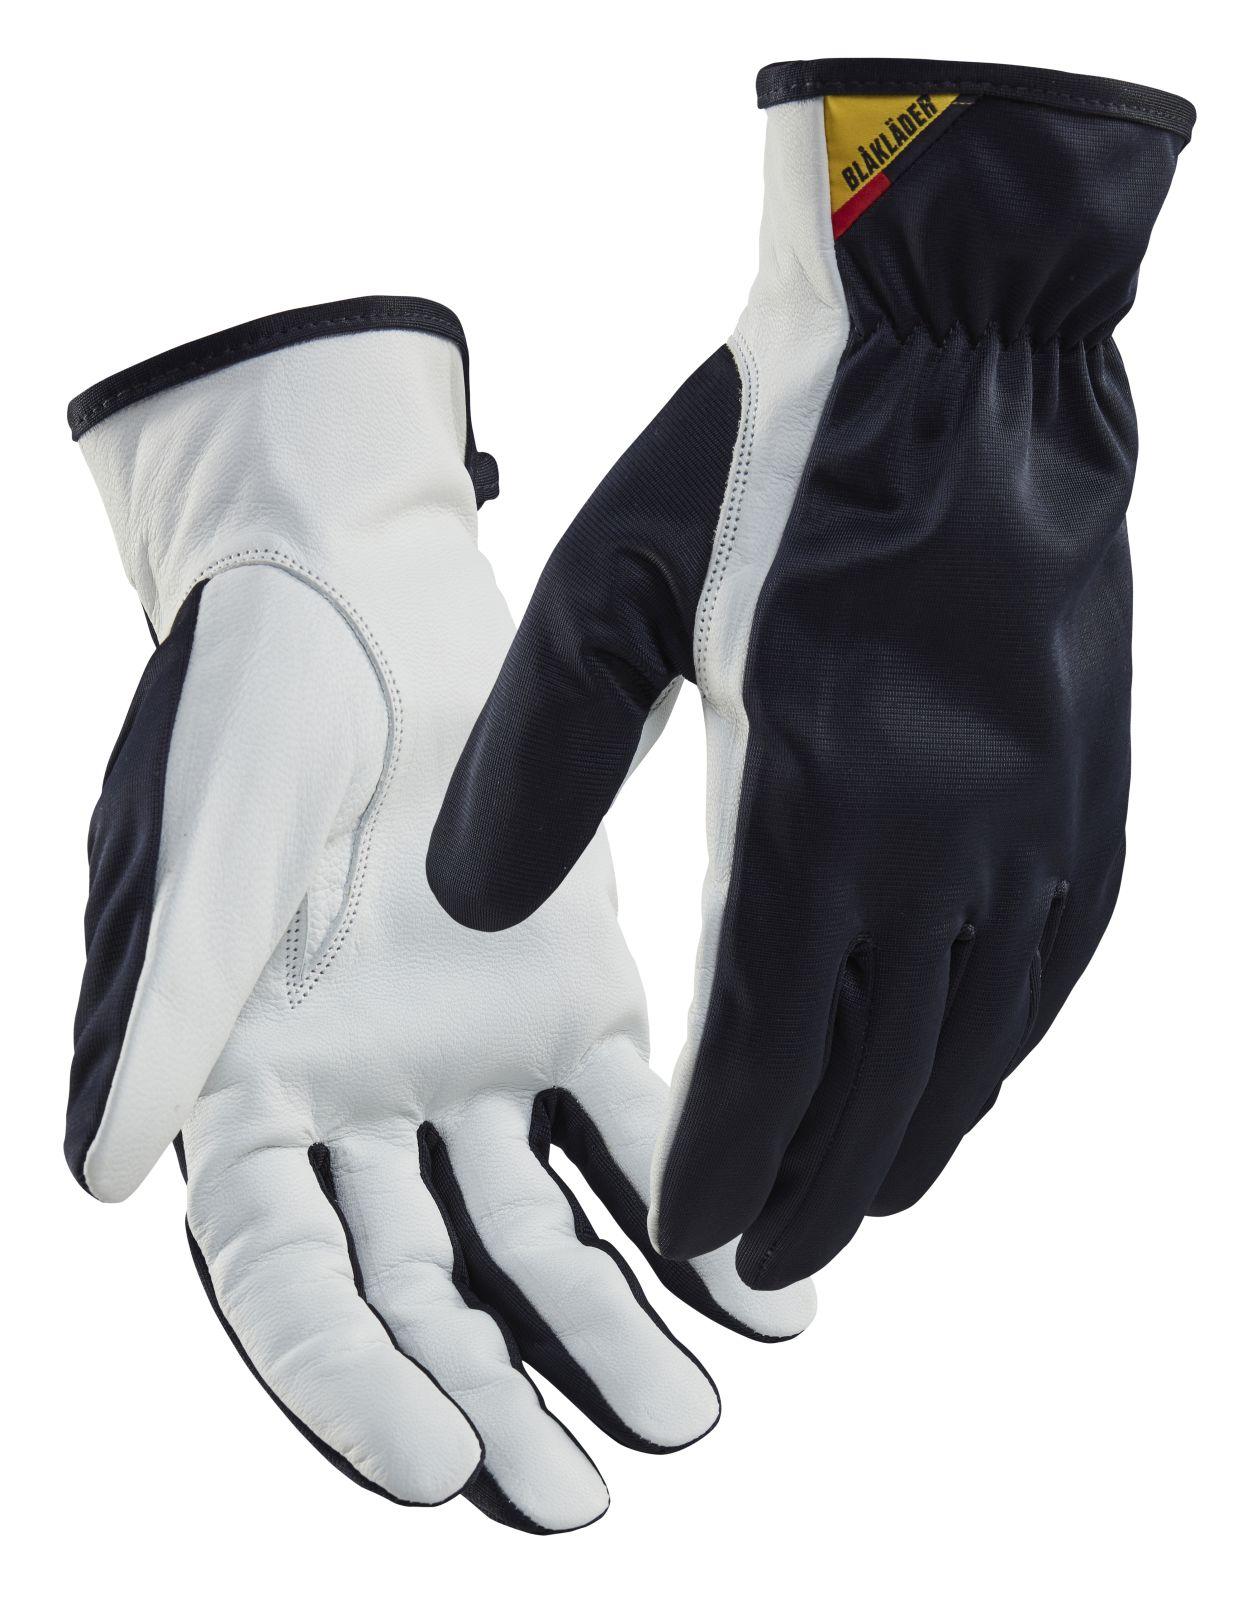 Blaklader Handschoenen 28021459 donker marineblauw-wit(8610)